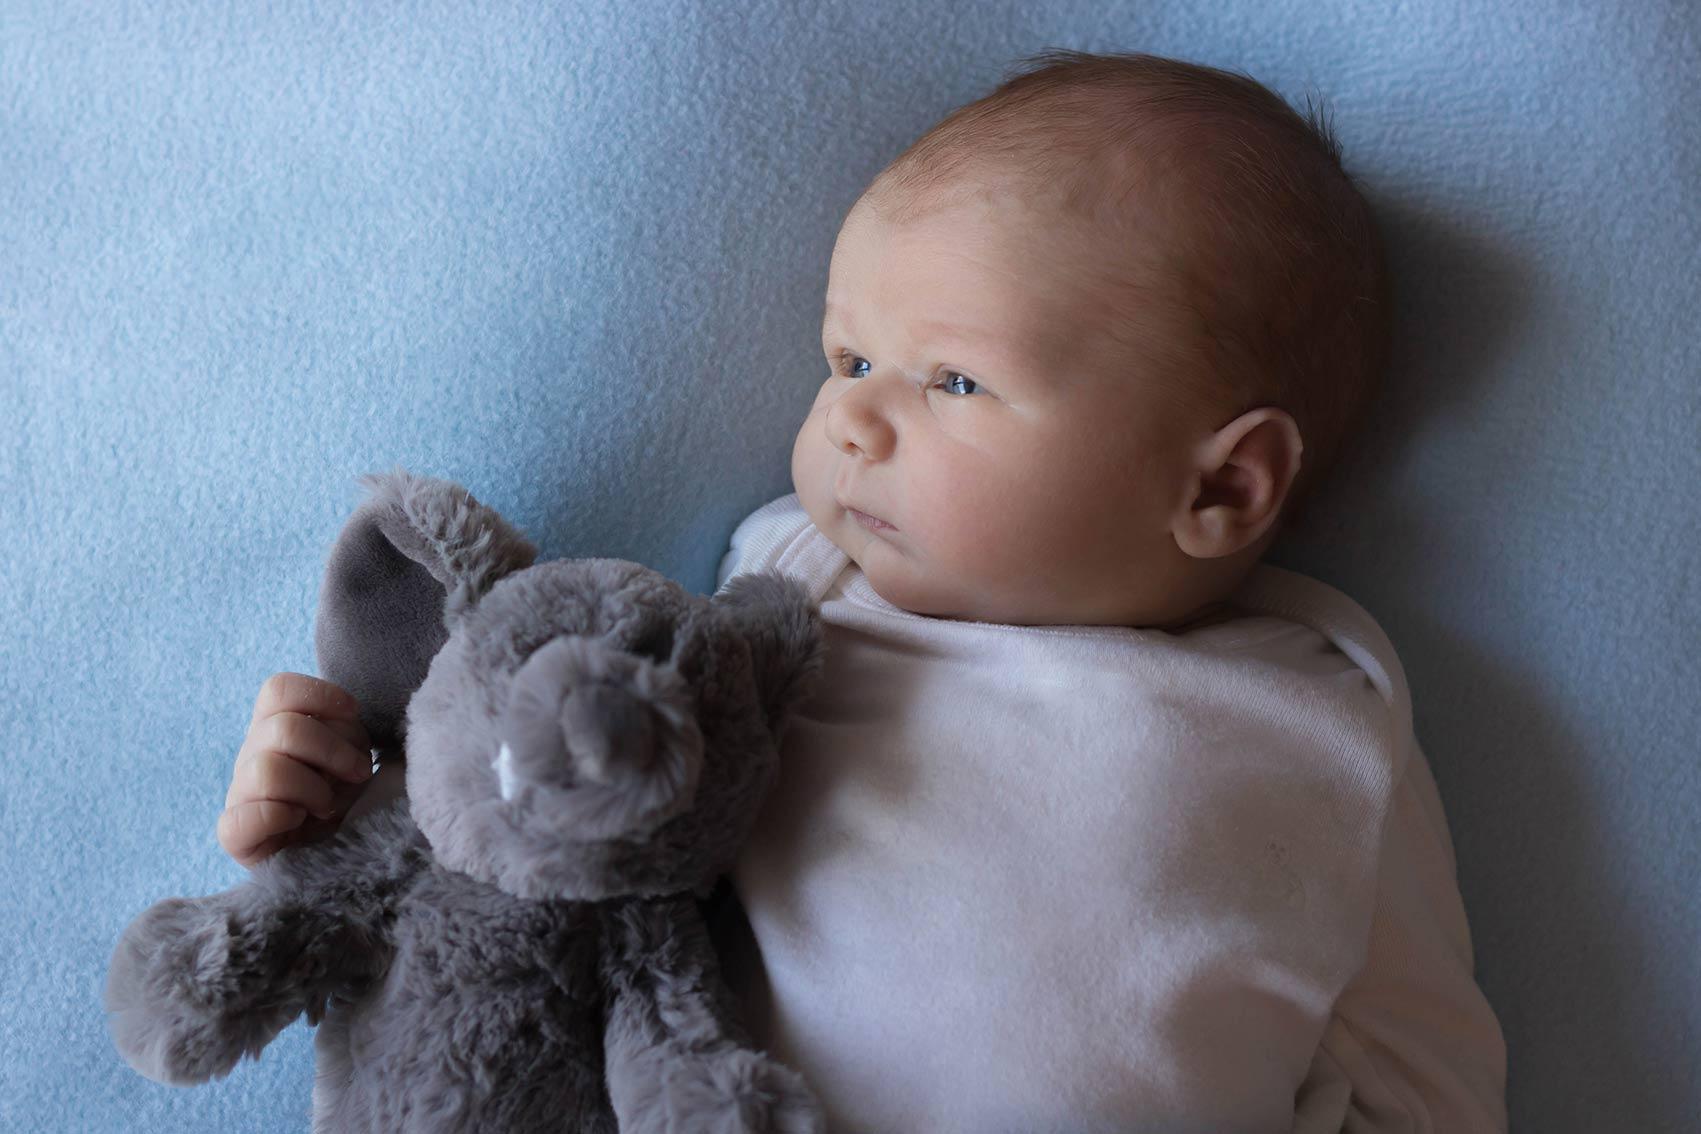 Newborn-Photography-BabyBoy-200kb-8